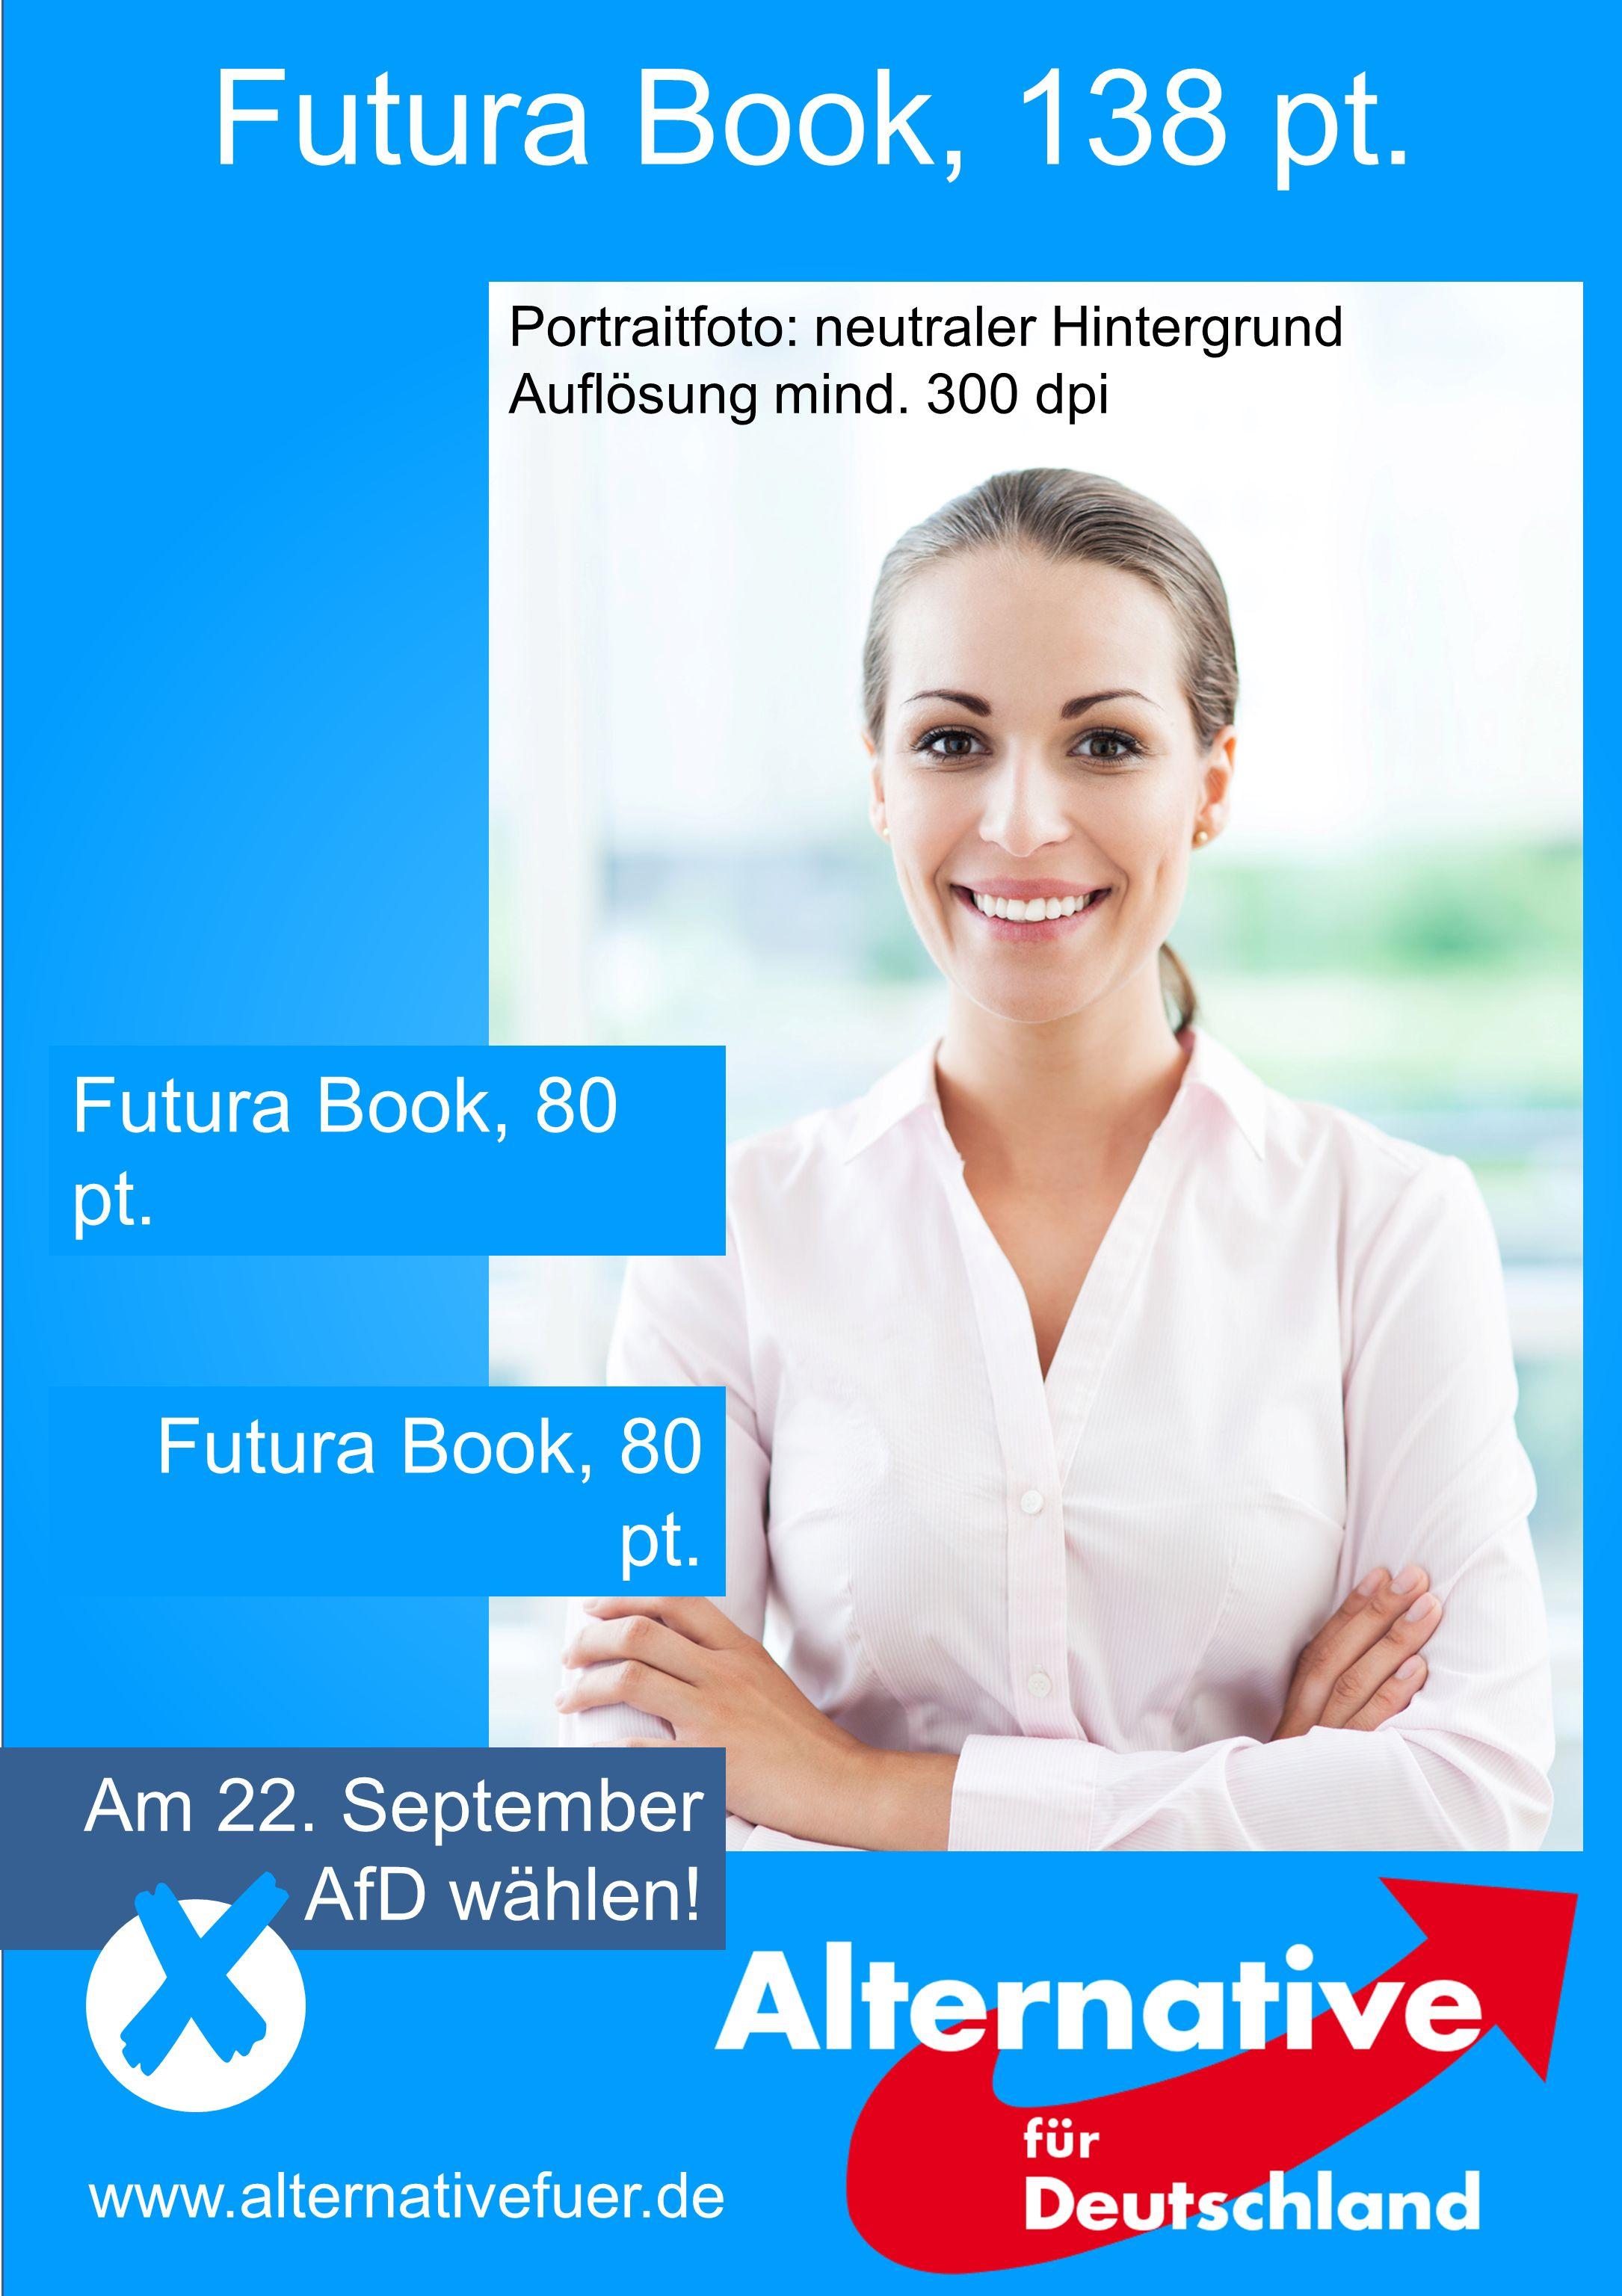 Futura Book, 138 pt. Futura Book, 80 pt. Futura Book, 80 pt.